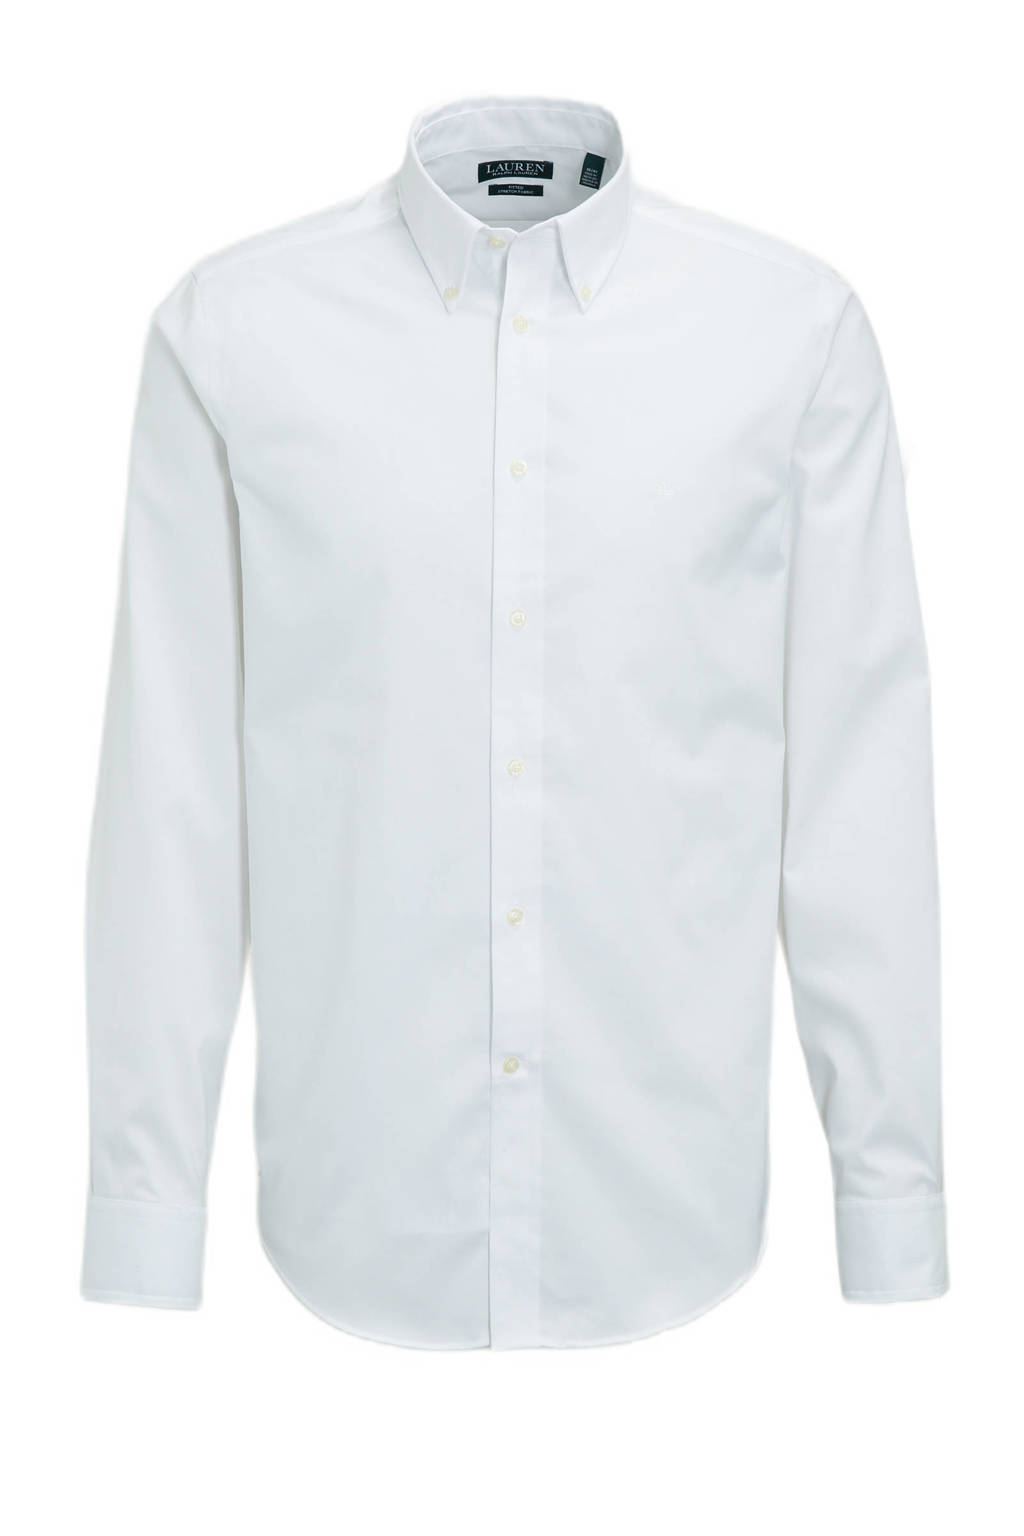 POLO Ralph Lauren slim fit overhemd wit, Wit